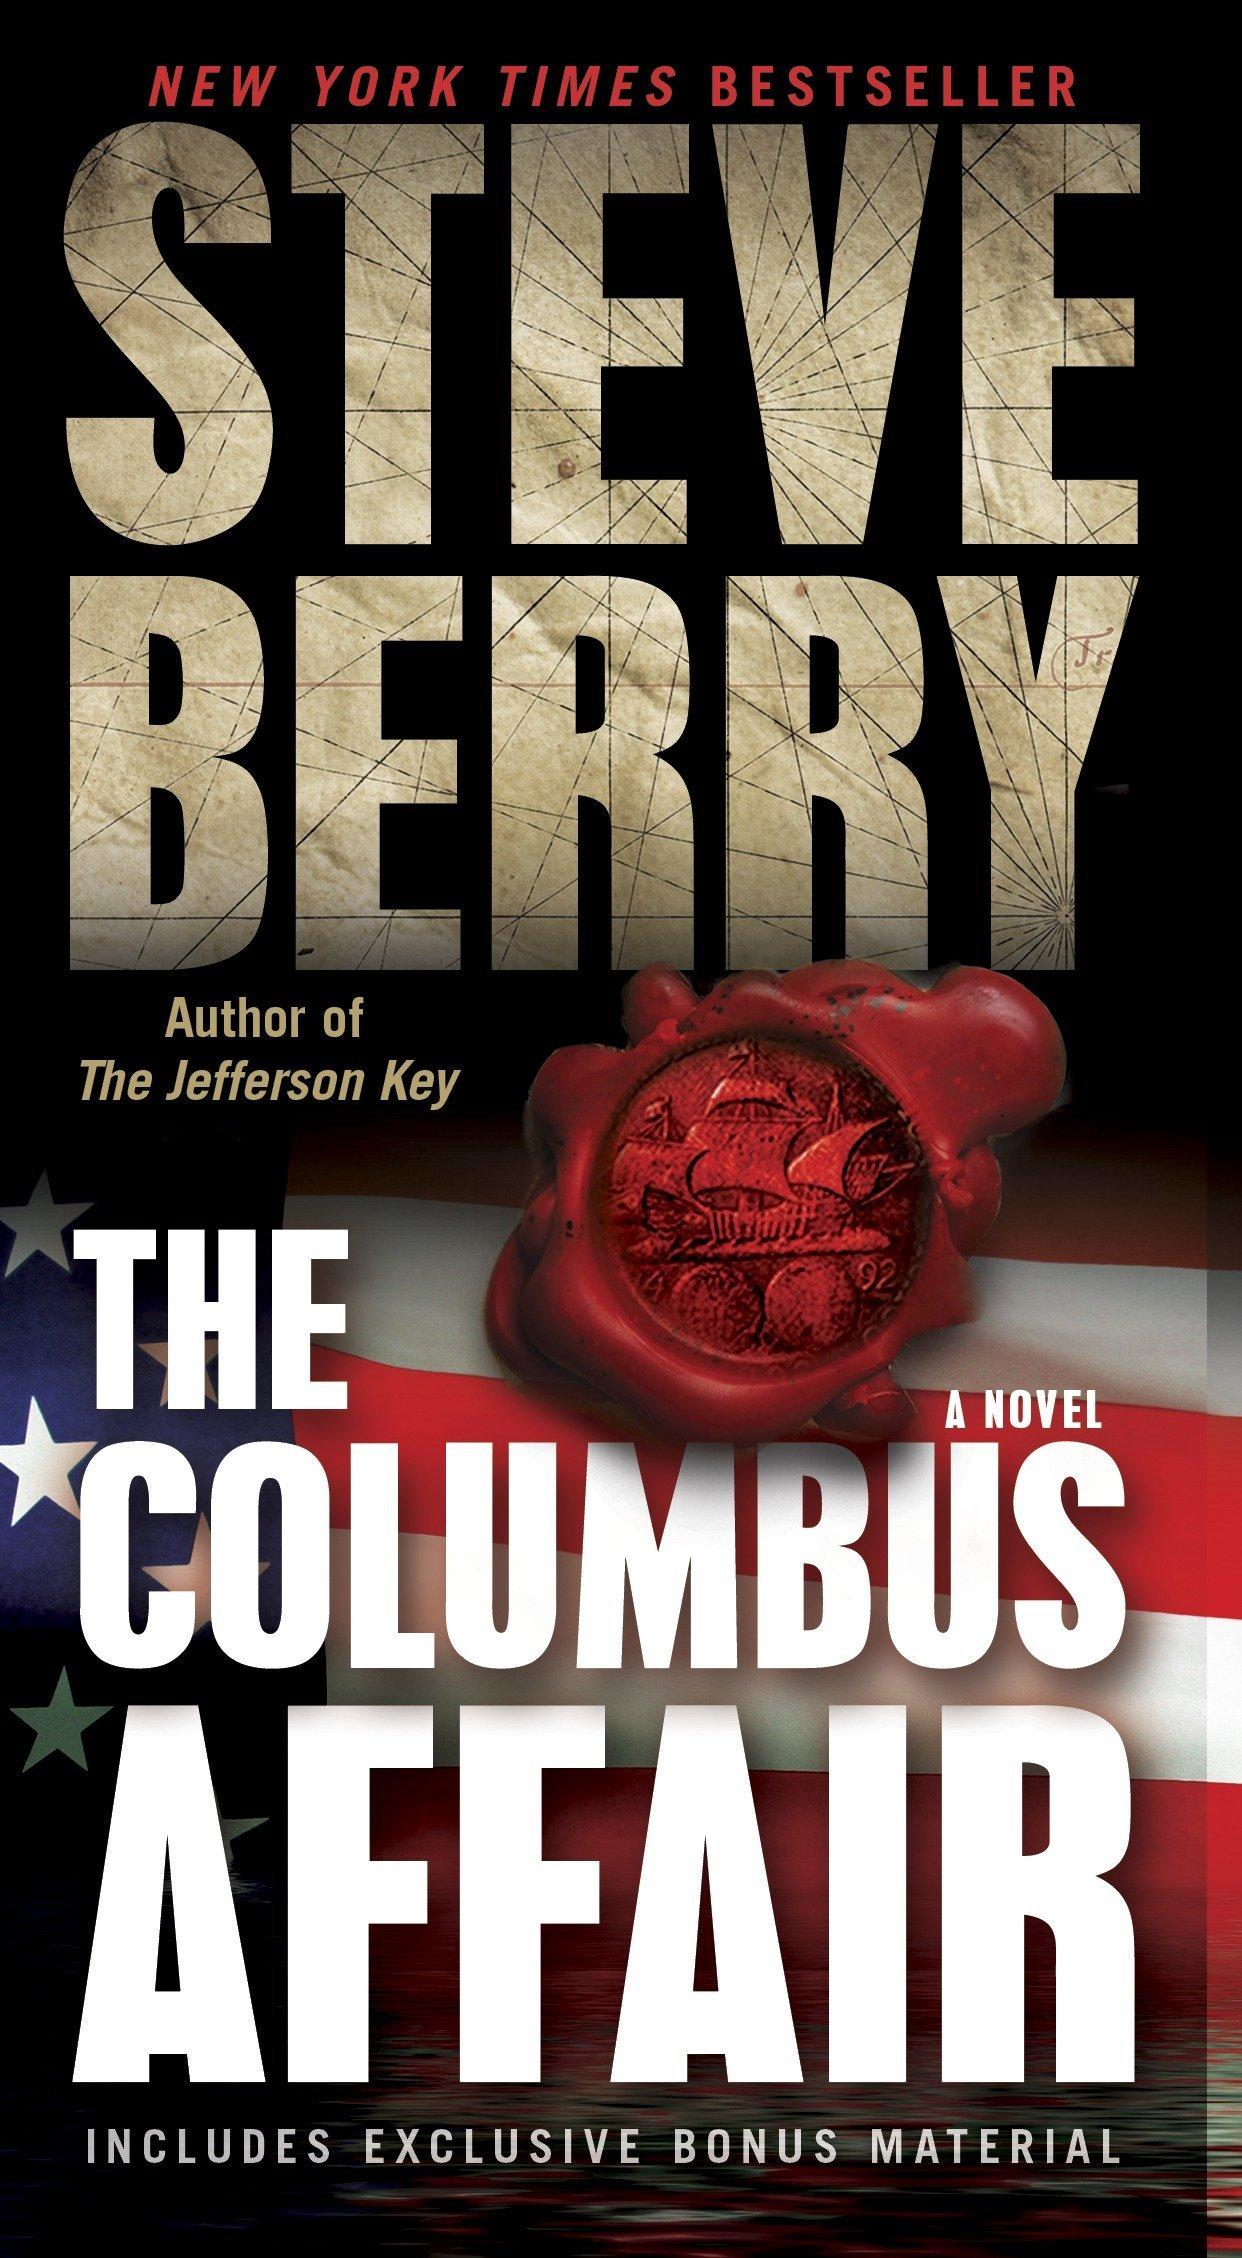 Amazon.com: The Columbus Affair: A Novel (with bonus short story The  Admiral's Mark) (9780345526526): Steve Berry: Books